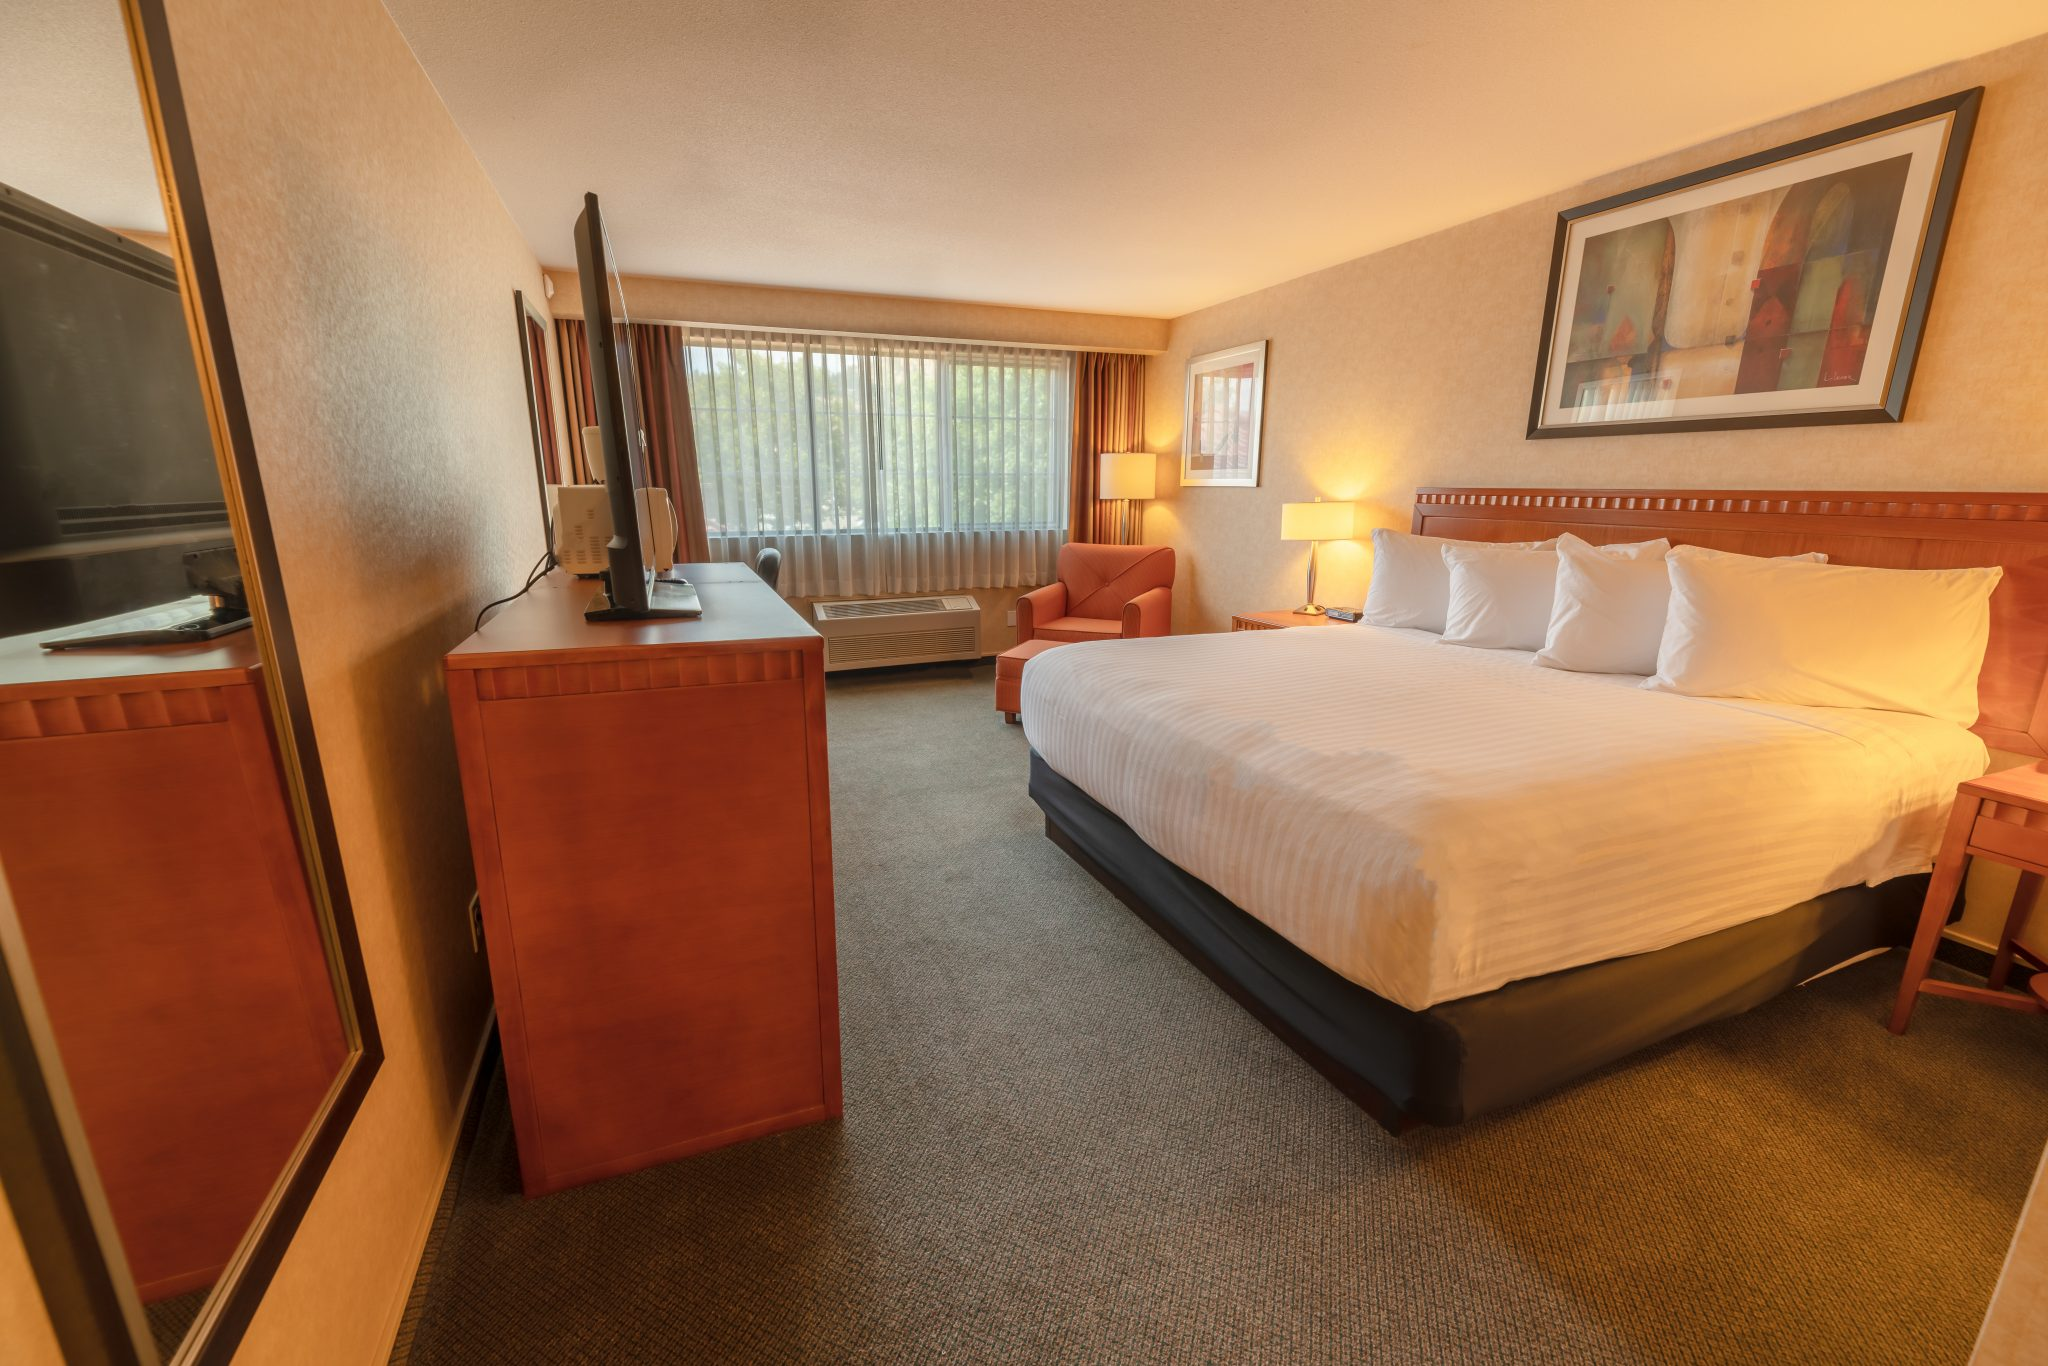 hotel in kelowna Kanata Inns Kelowna King Bed